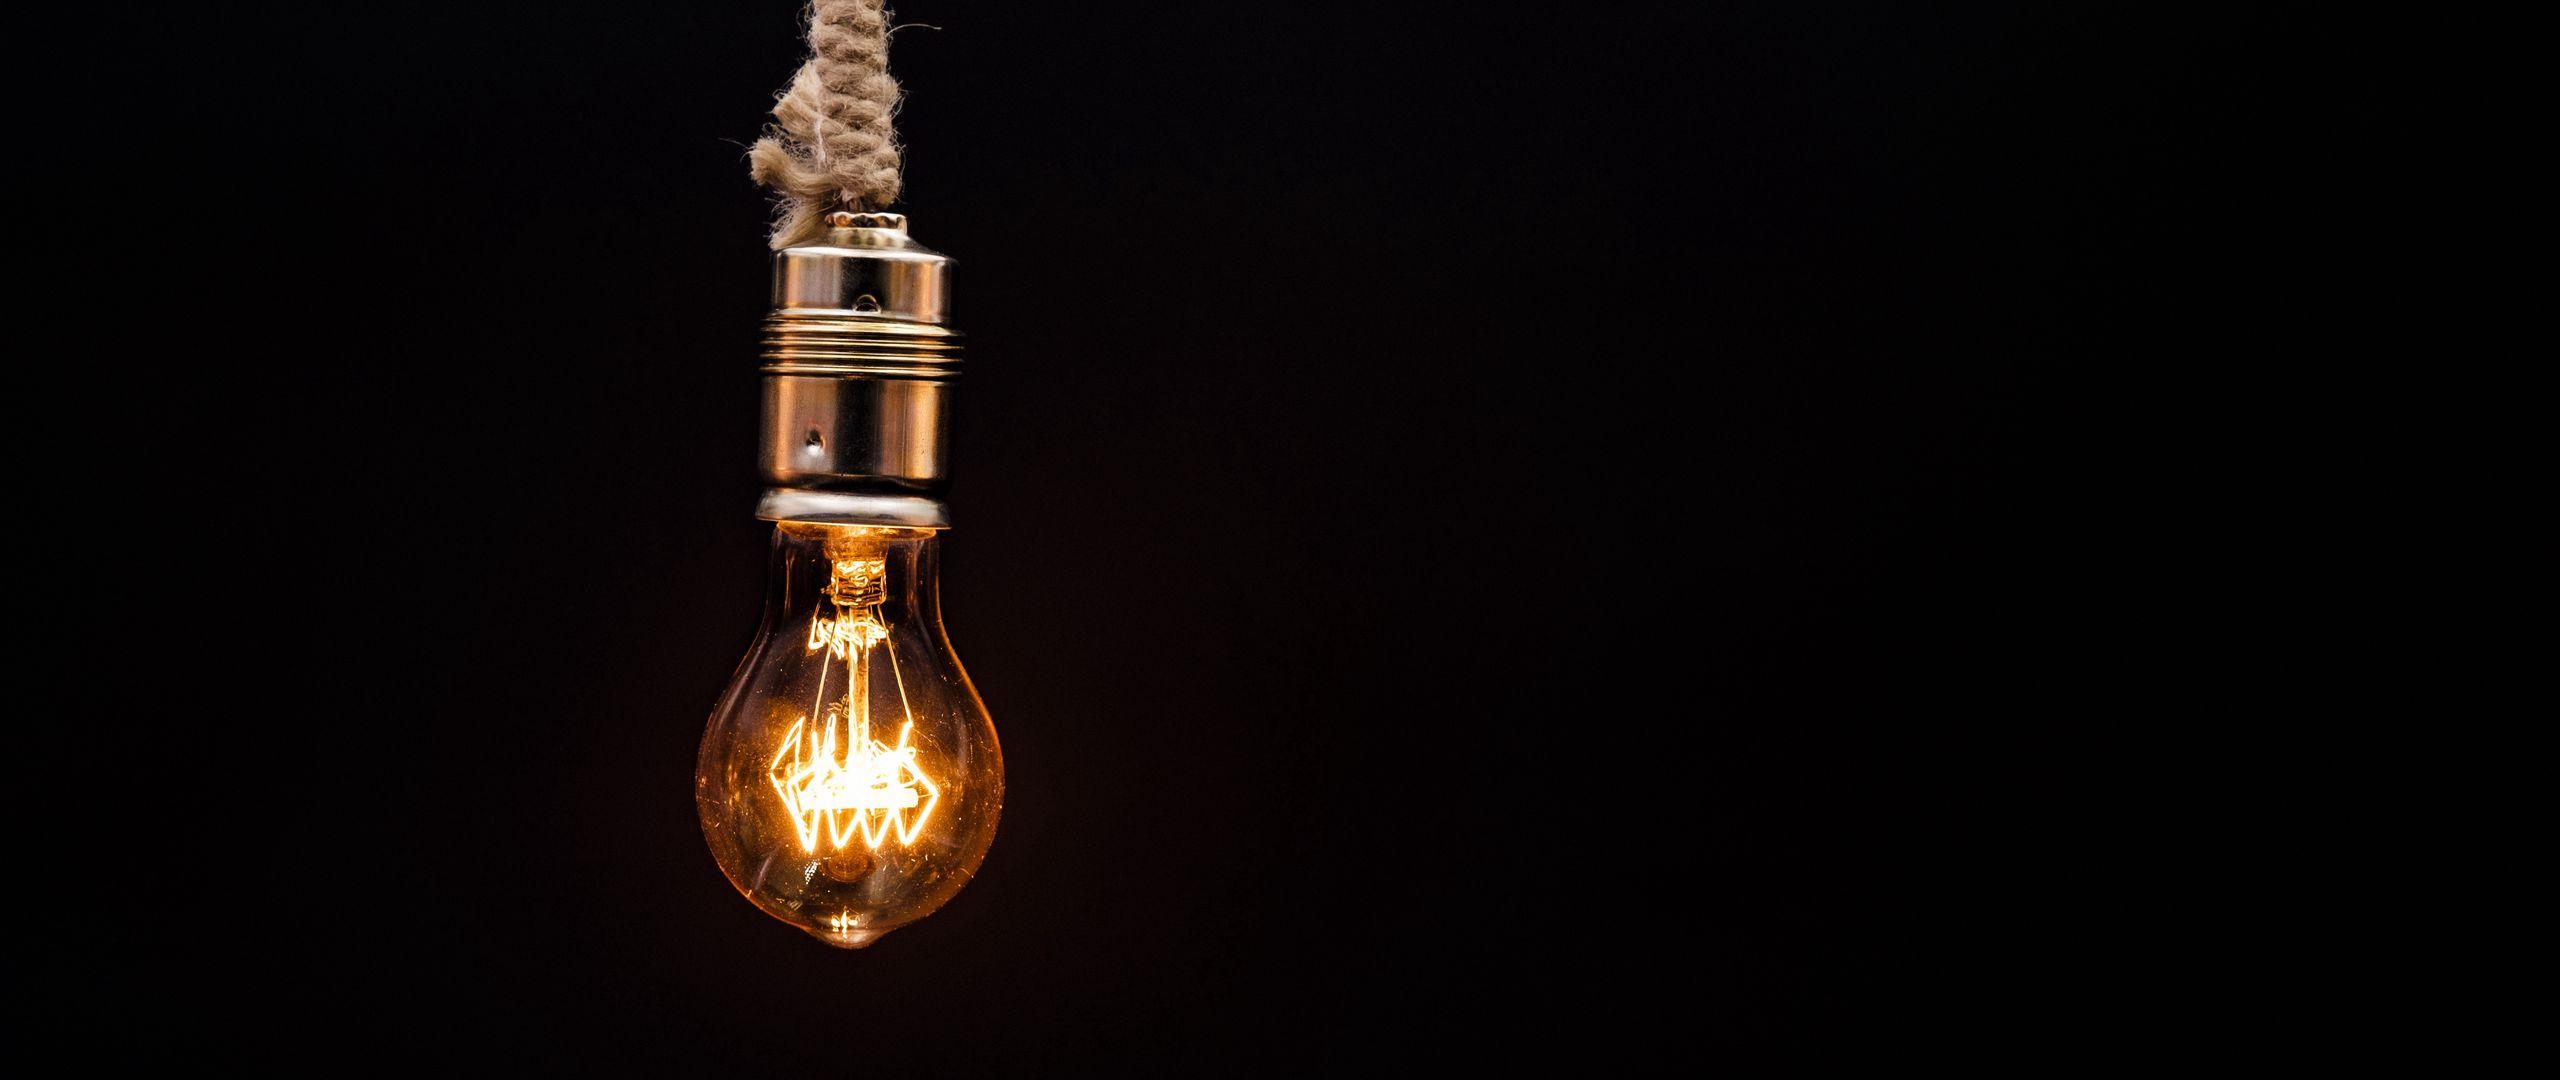 2560x1080 Wallpaper bulb, lighting, rope, electricity, edisons lamp